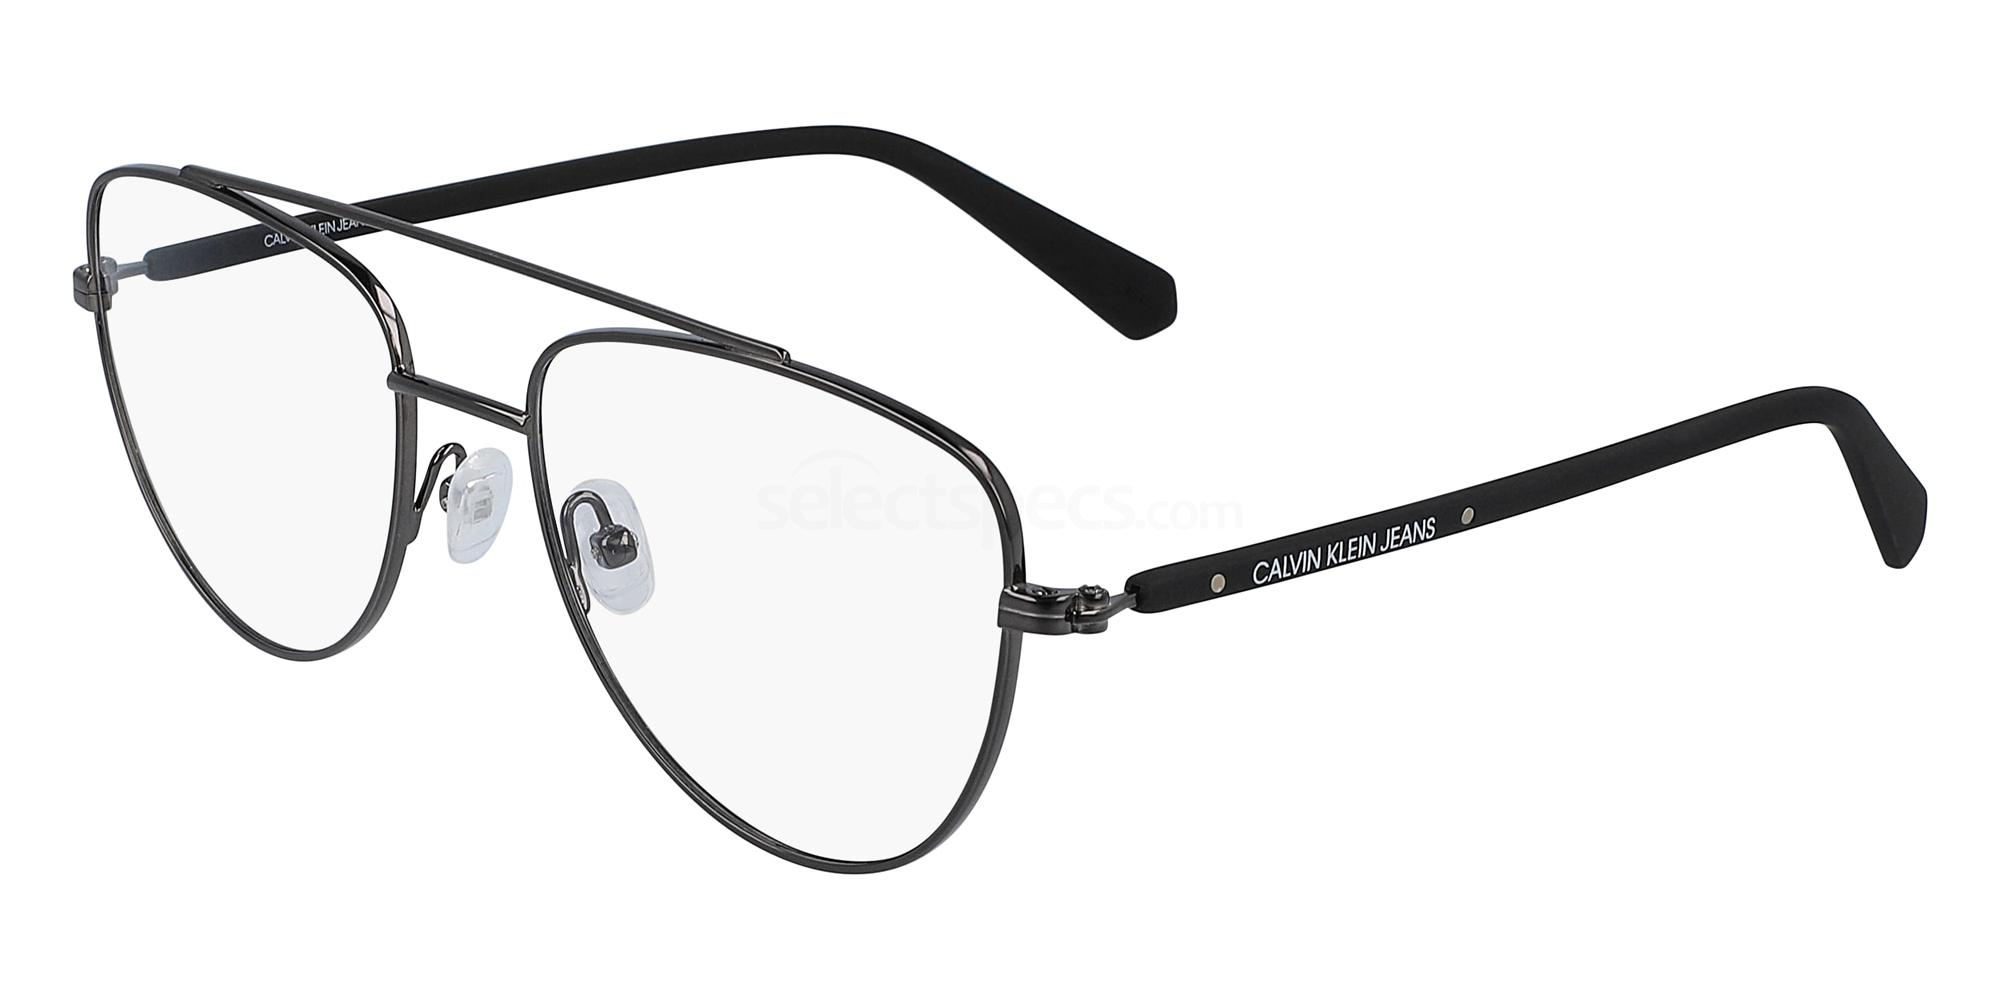 008 CKJ19308 Glasses, Calvin Klein Jeans